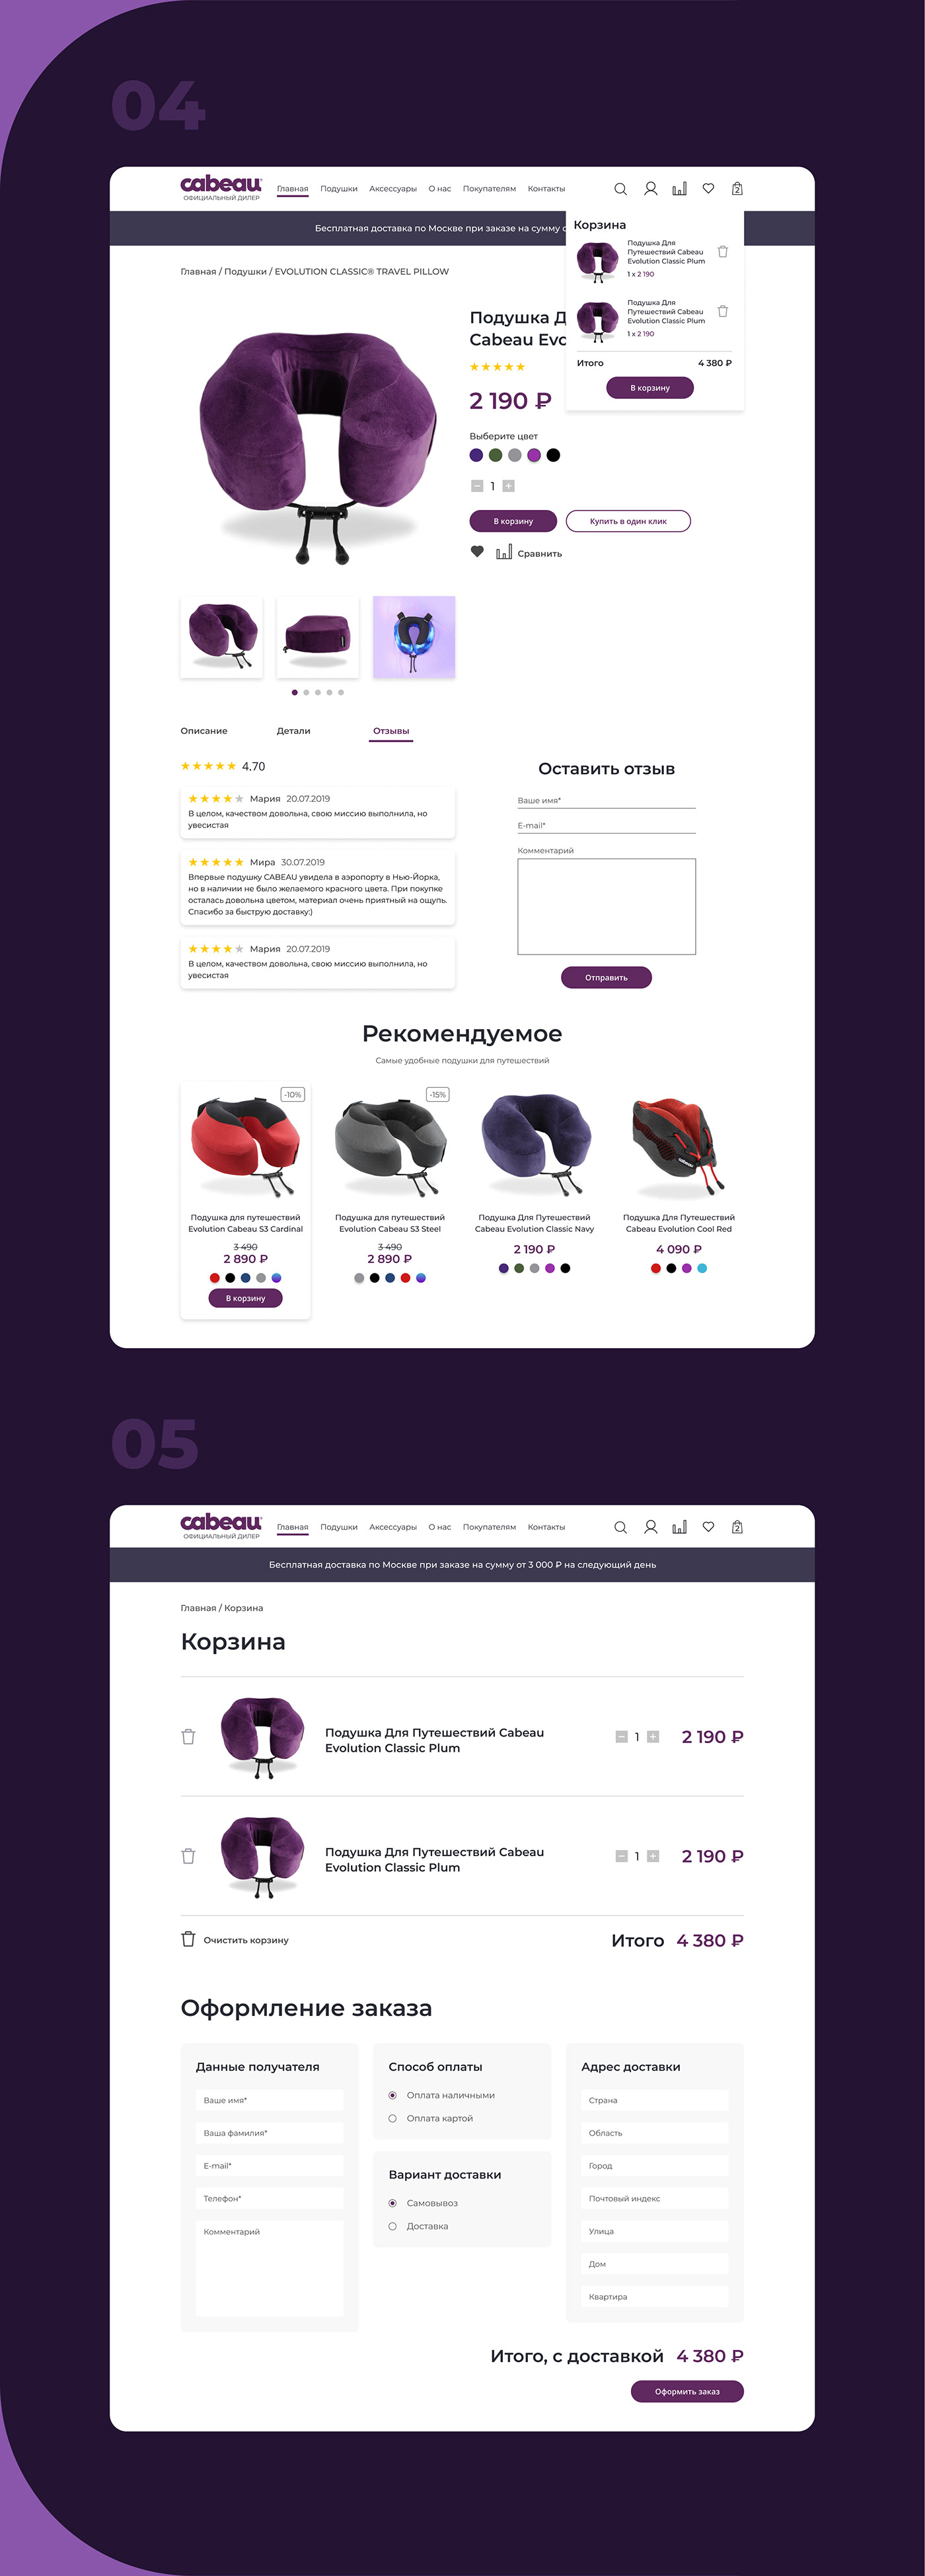 adventure Airbag cabeau comfort online shopping pillow tourist Travel violet Website